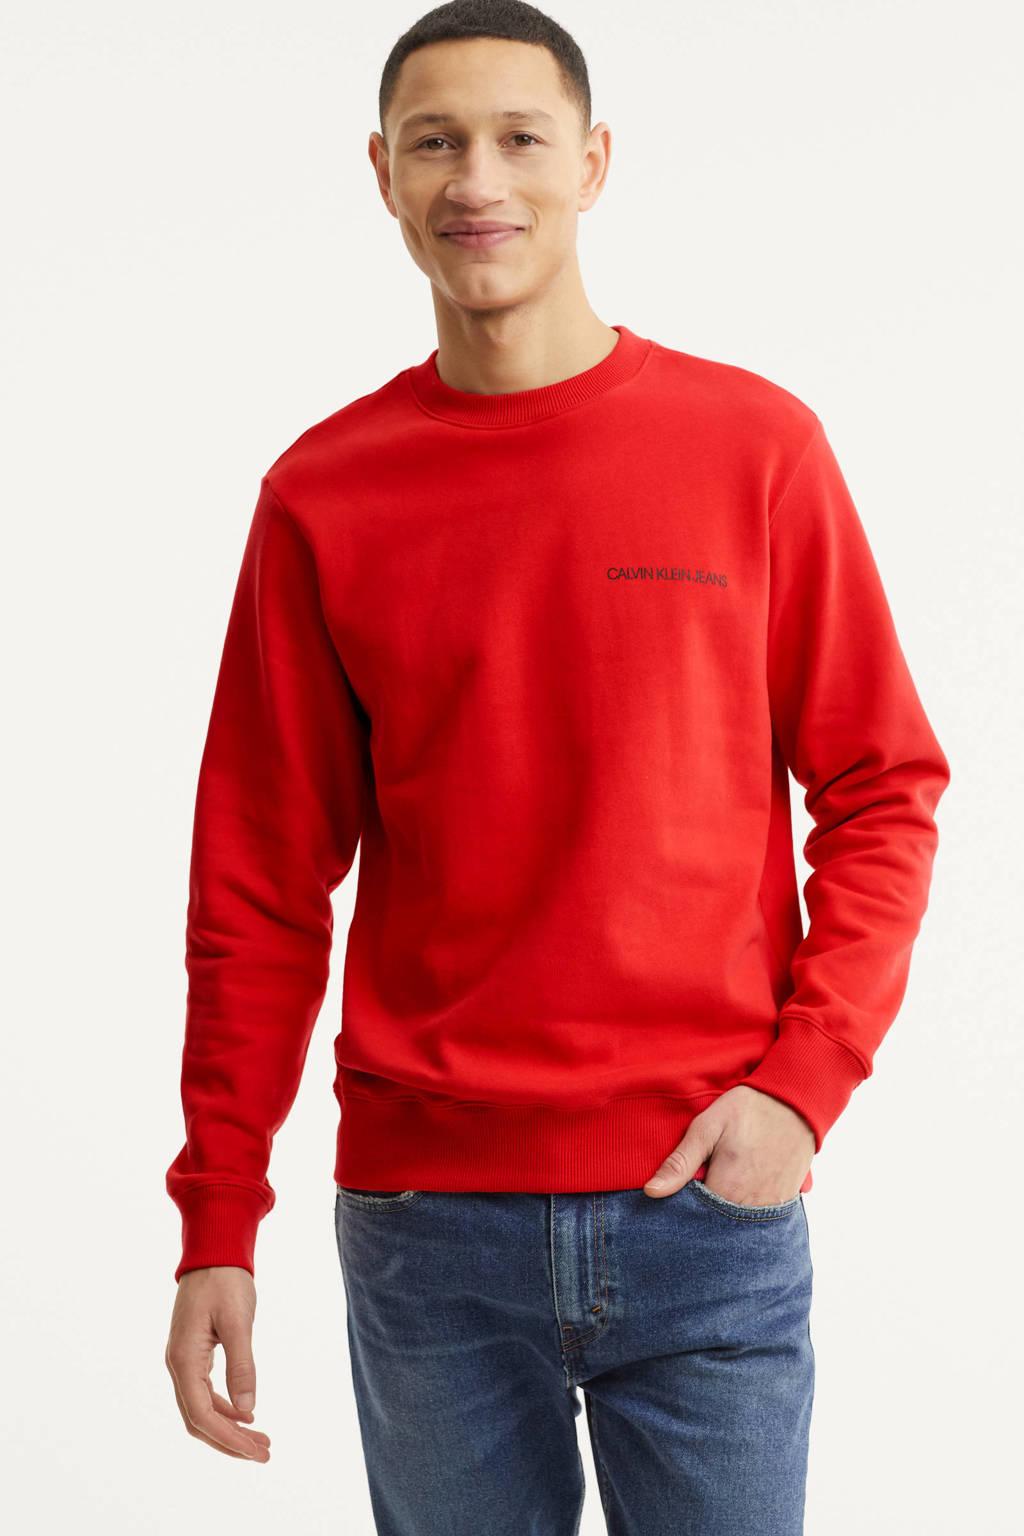 CALVIN KLEIN JEANS sweater met logo rood, Rood